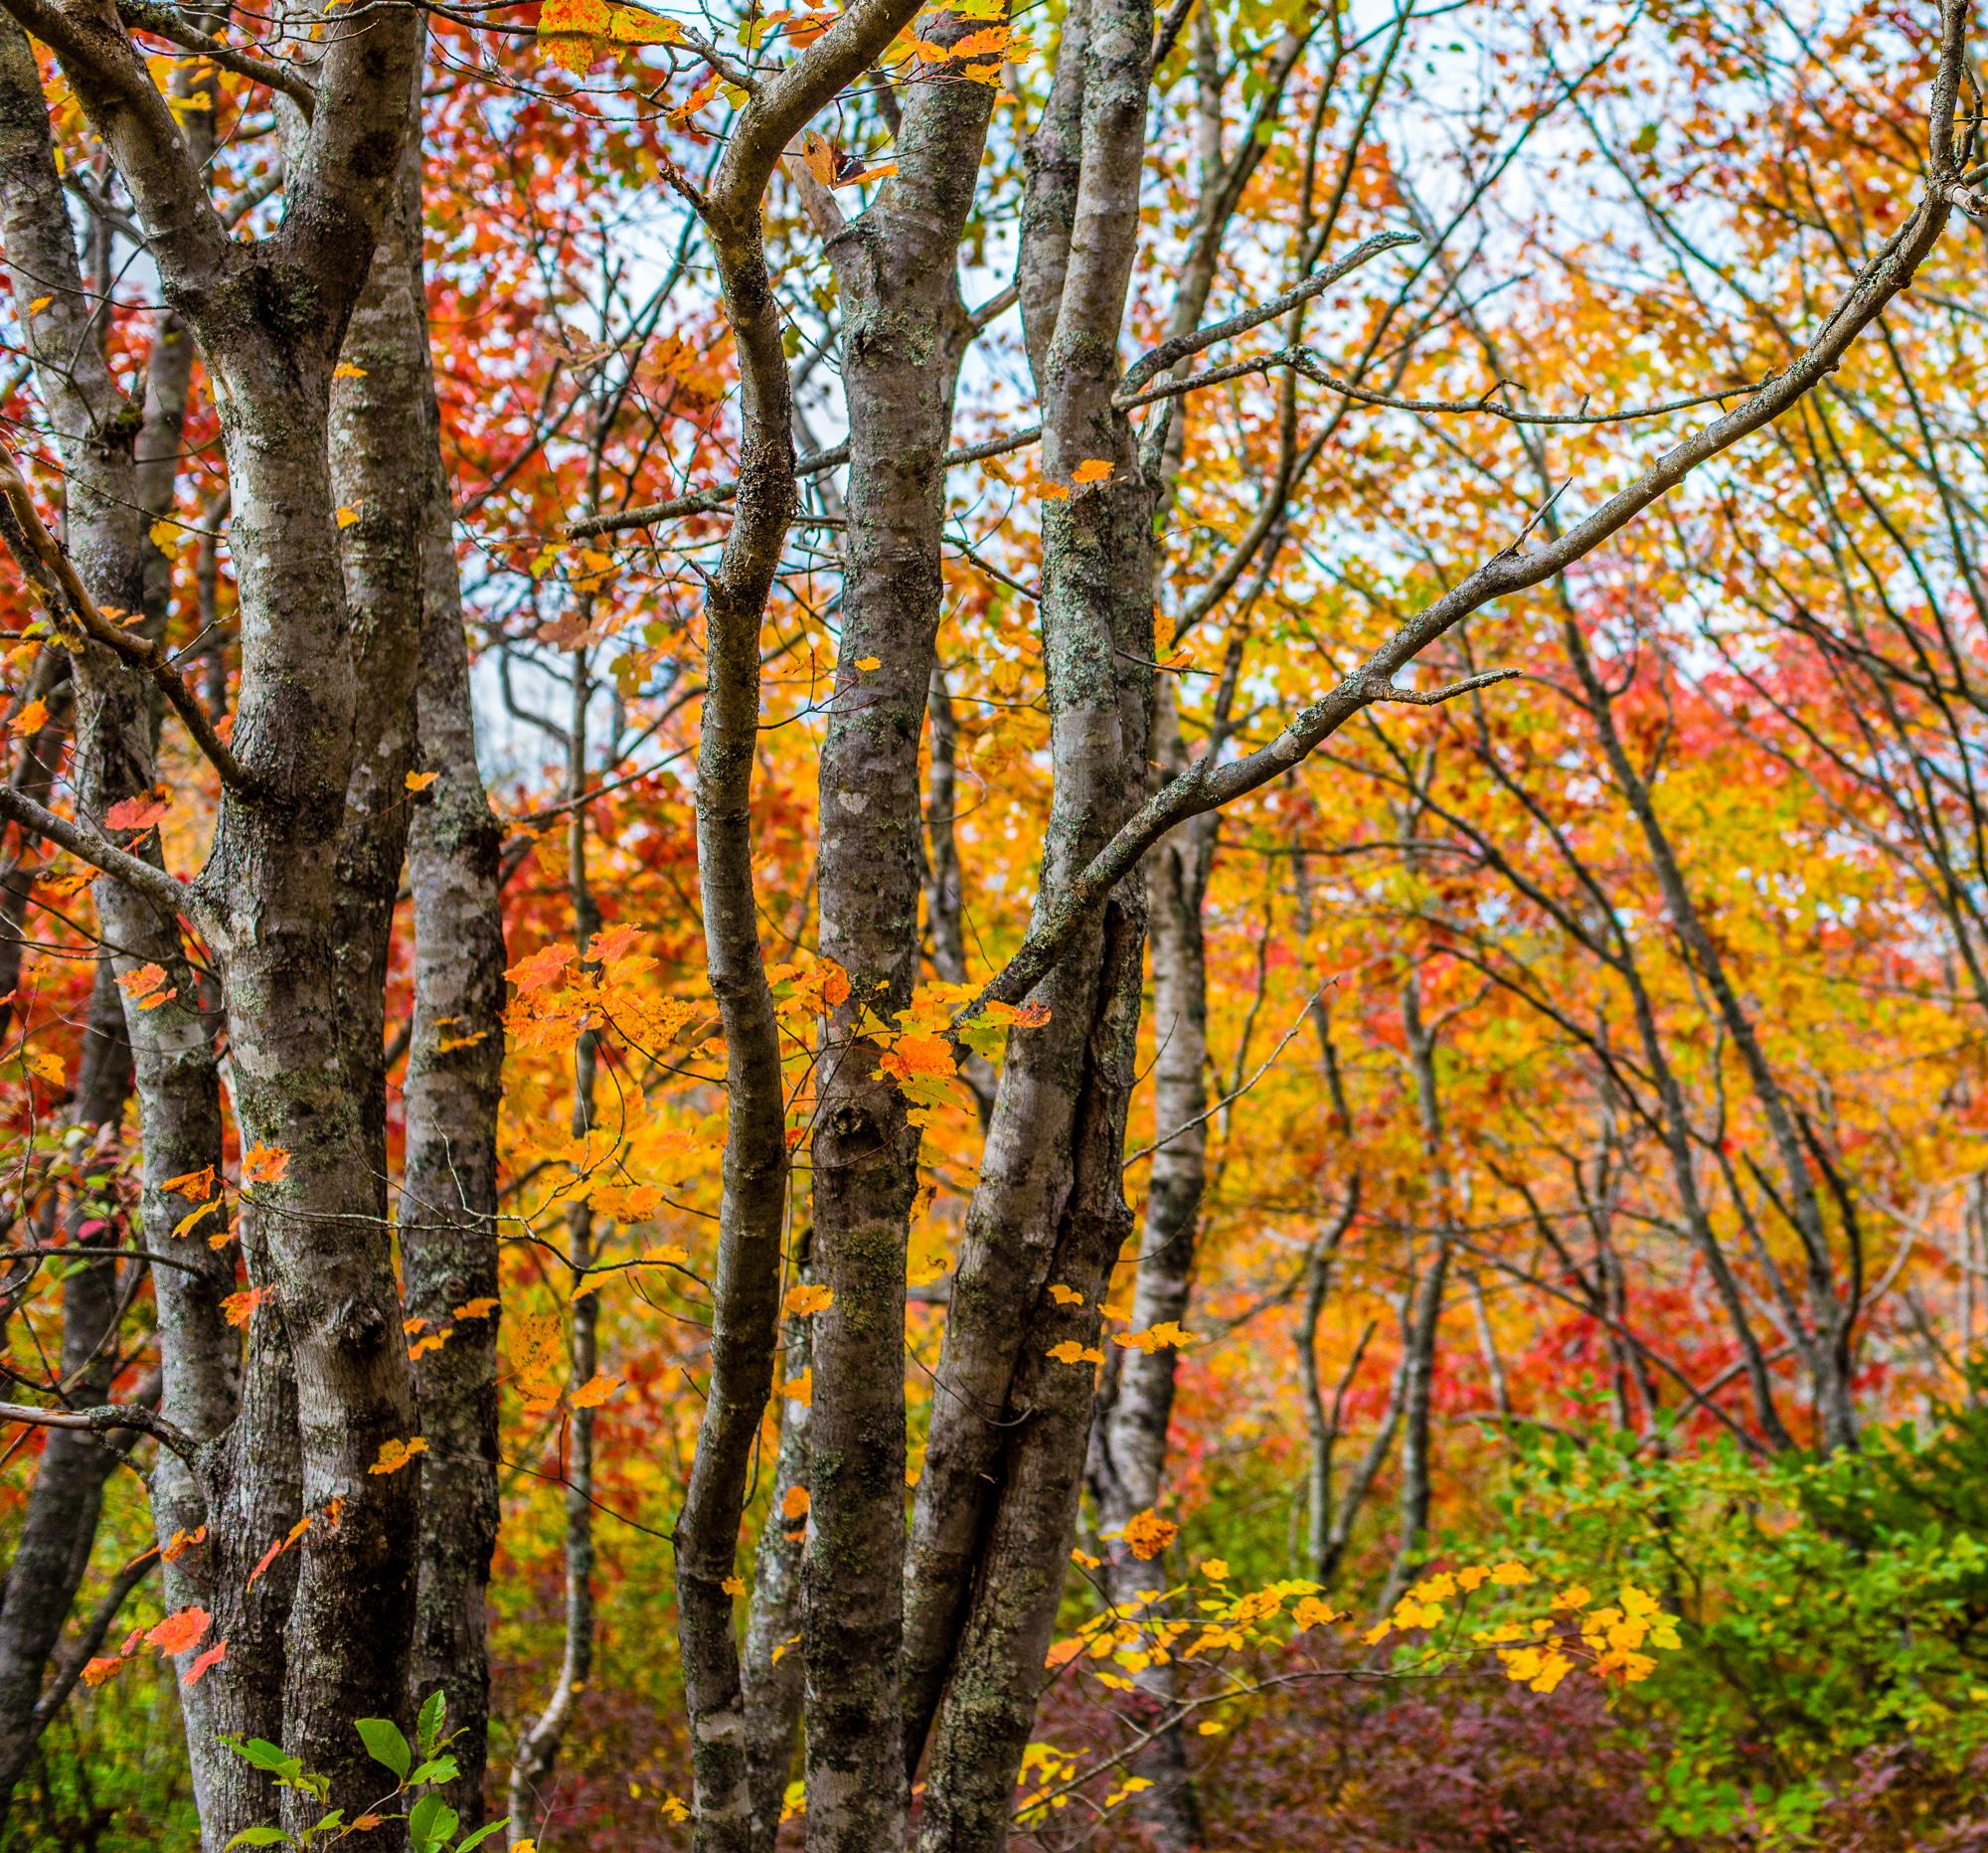 Bluff Wilderness Trail, Halifax Nova Scotia